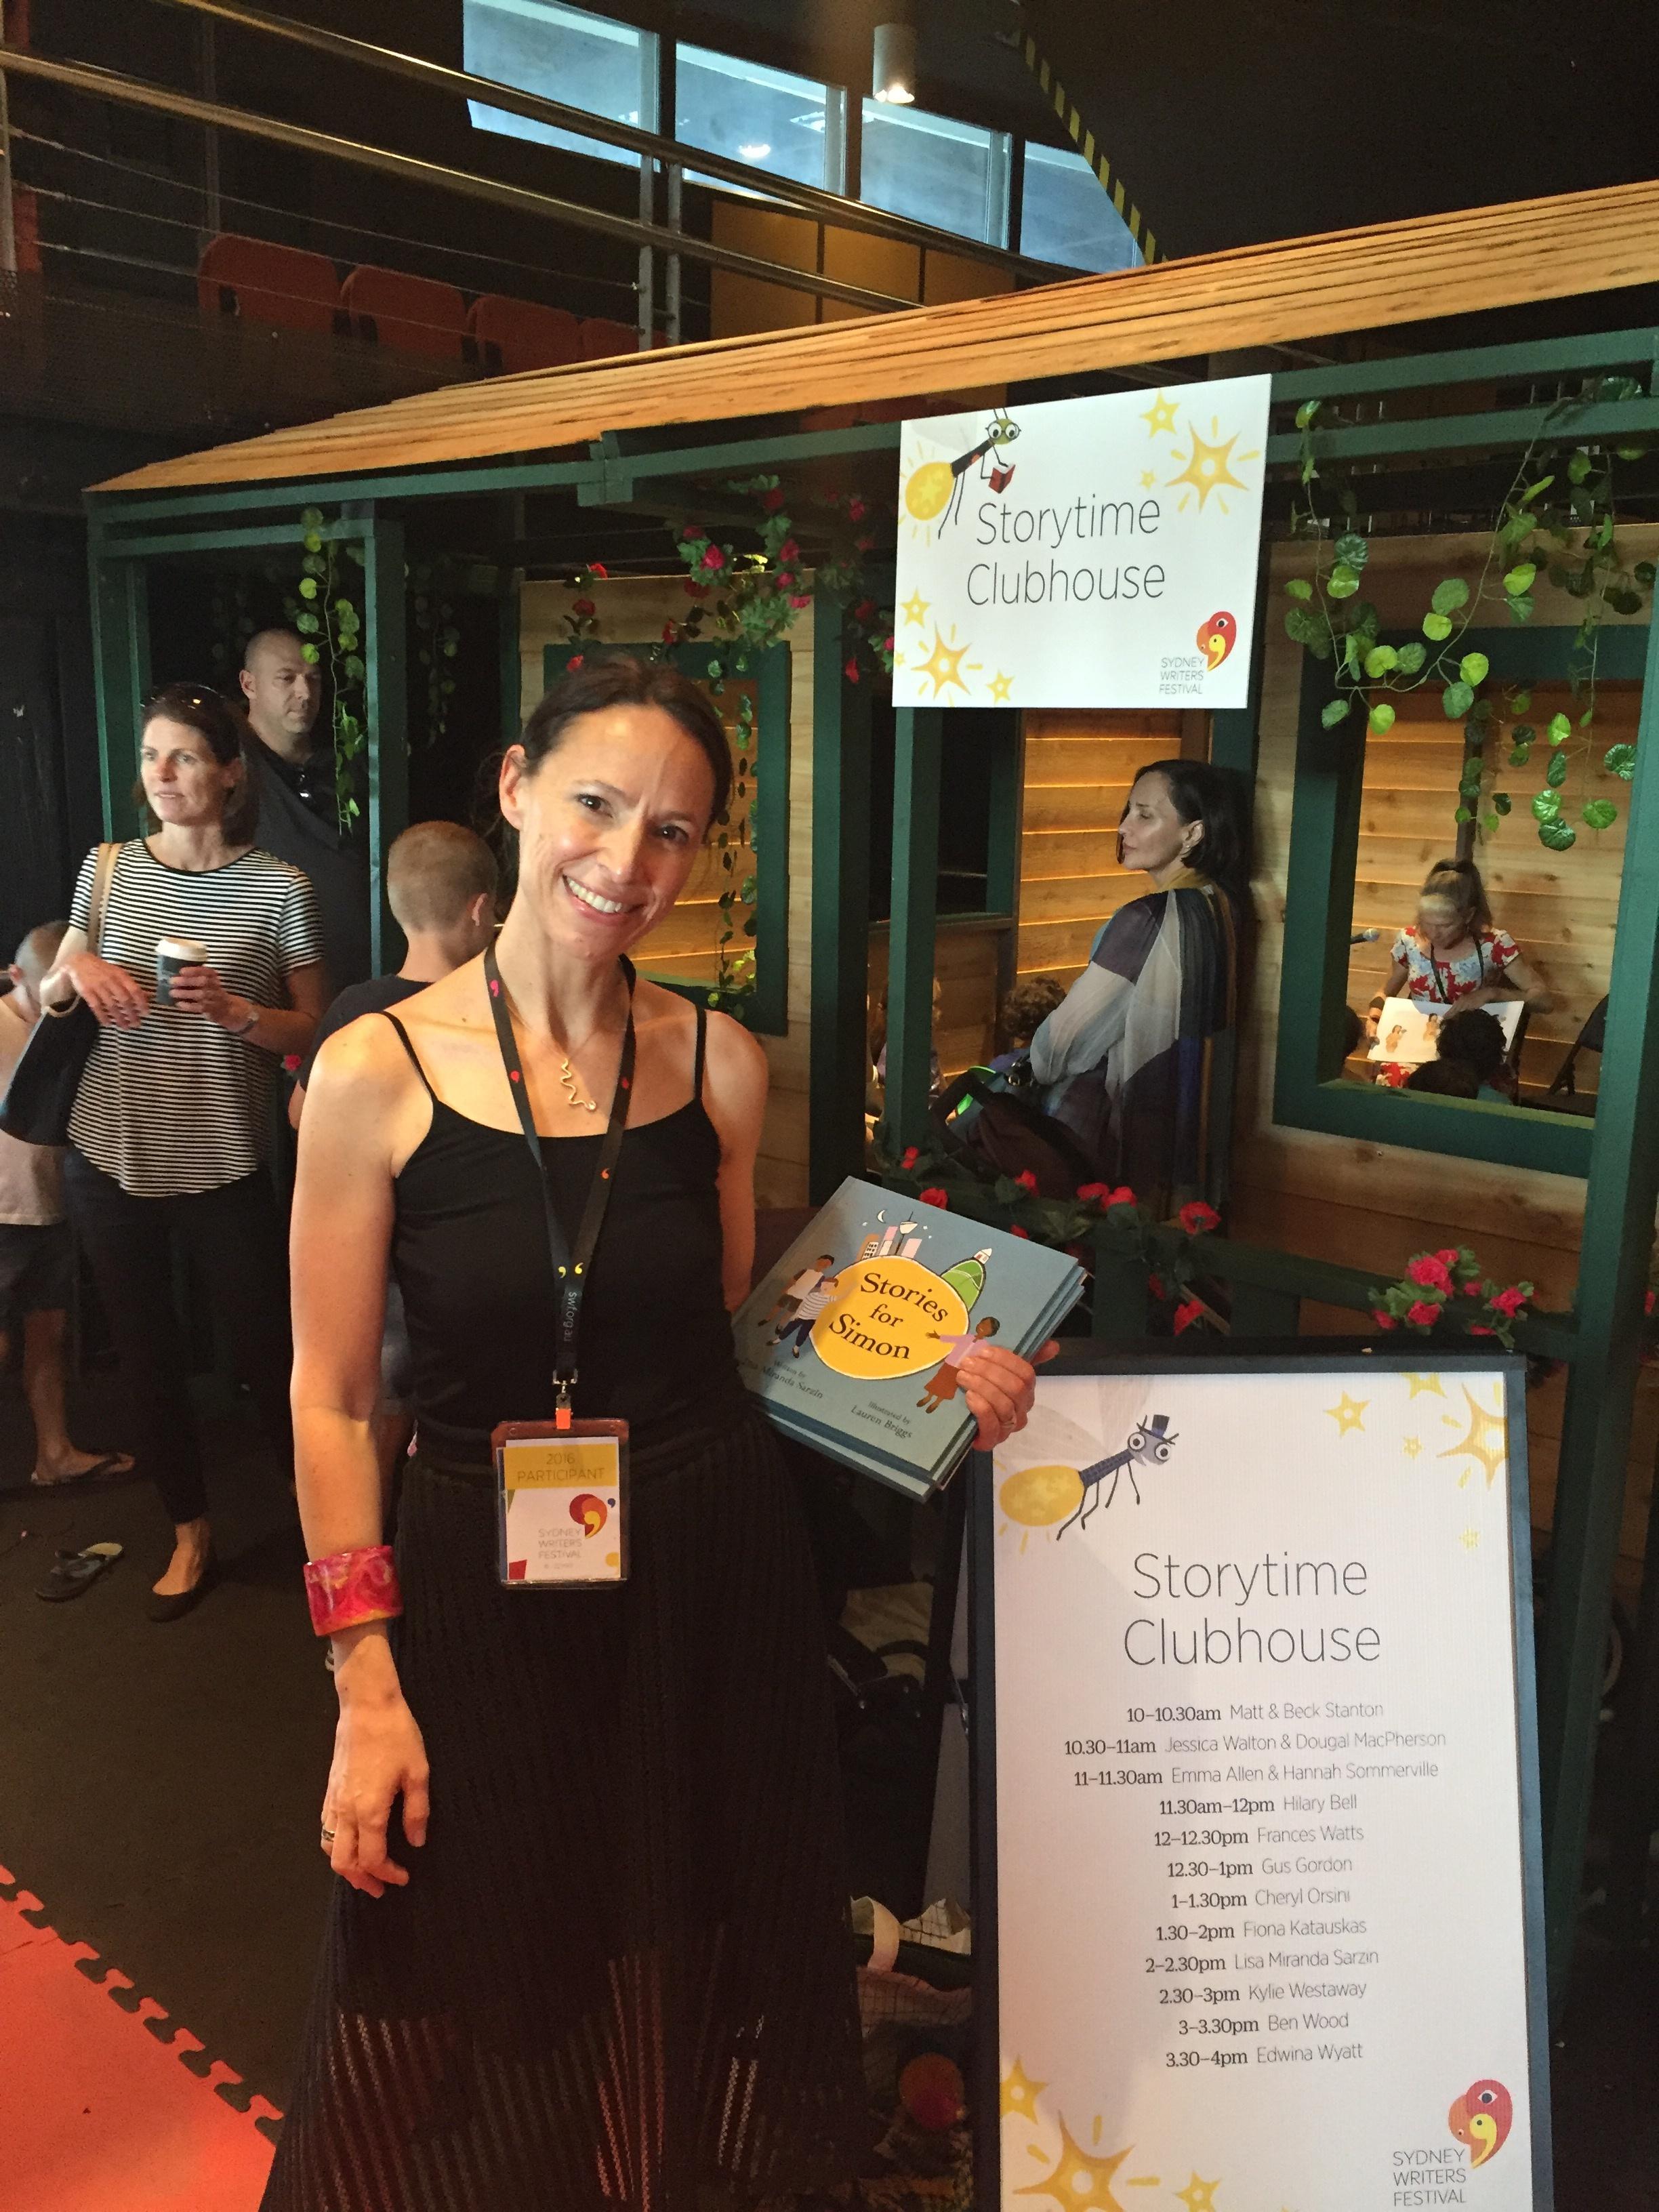 SYDNEY WRITERS FESTIVAL 2016